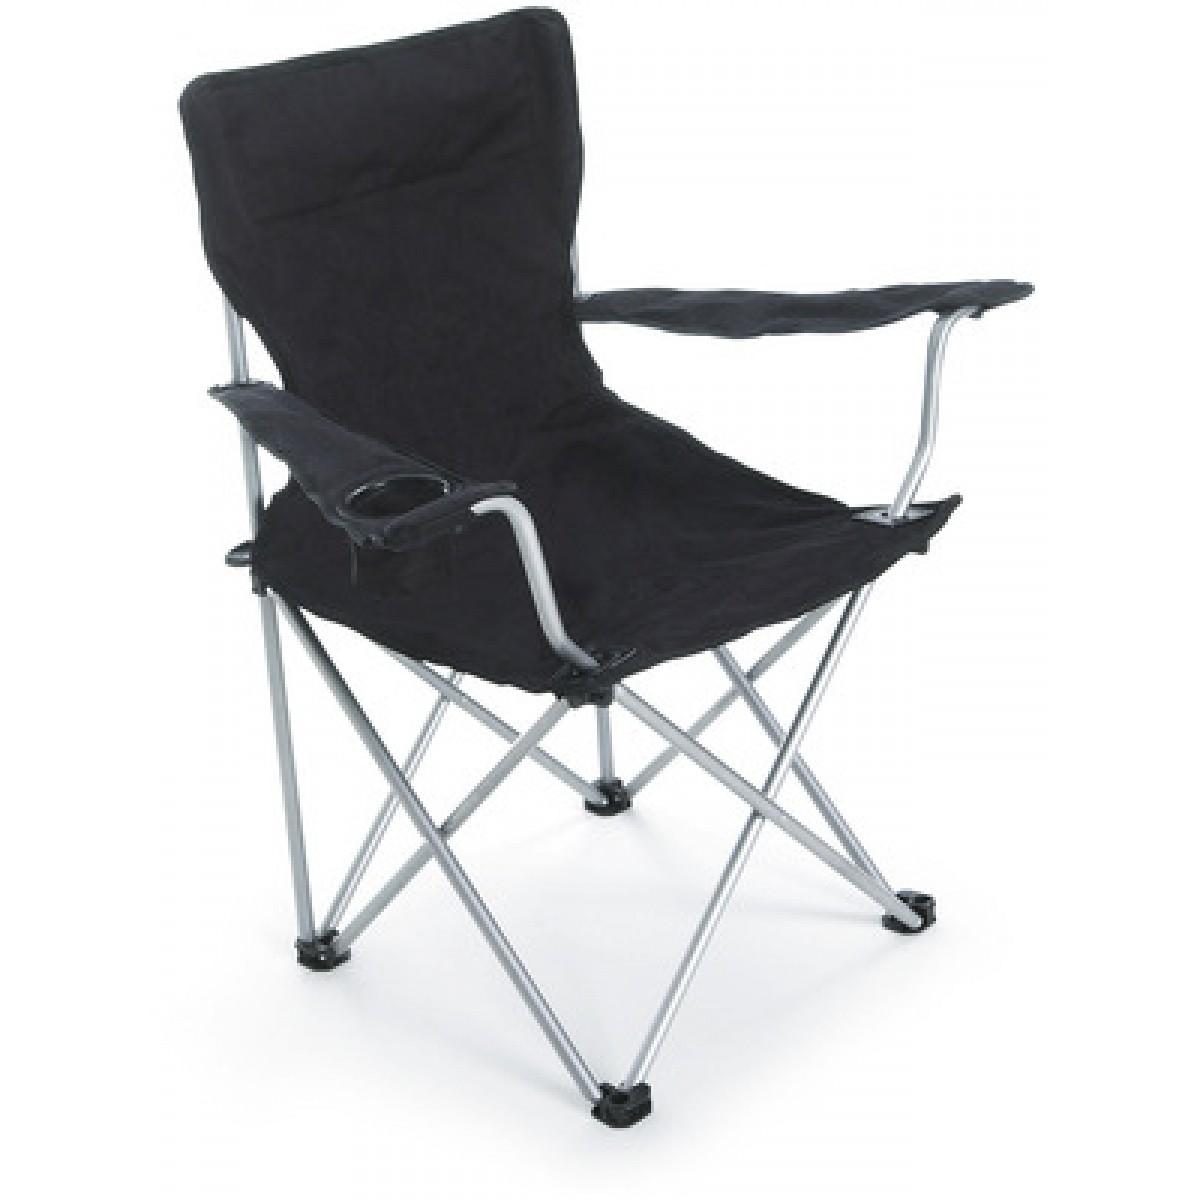 marie 9 spirit of tt piste equipement accessoires. Black Bedroom Furniture Sets. Home Design Ideas